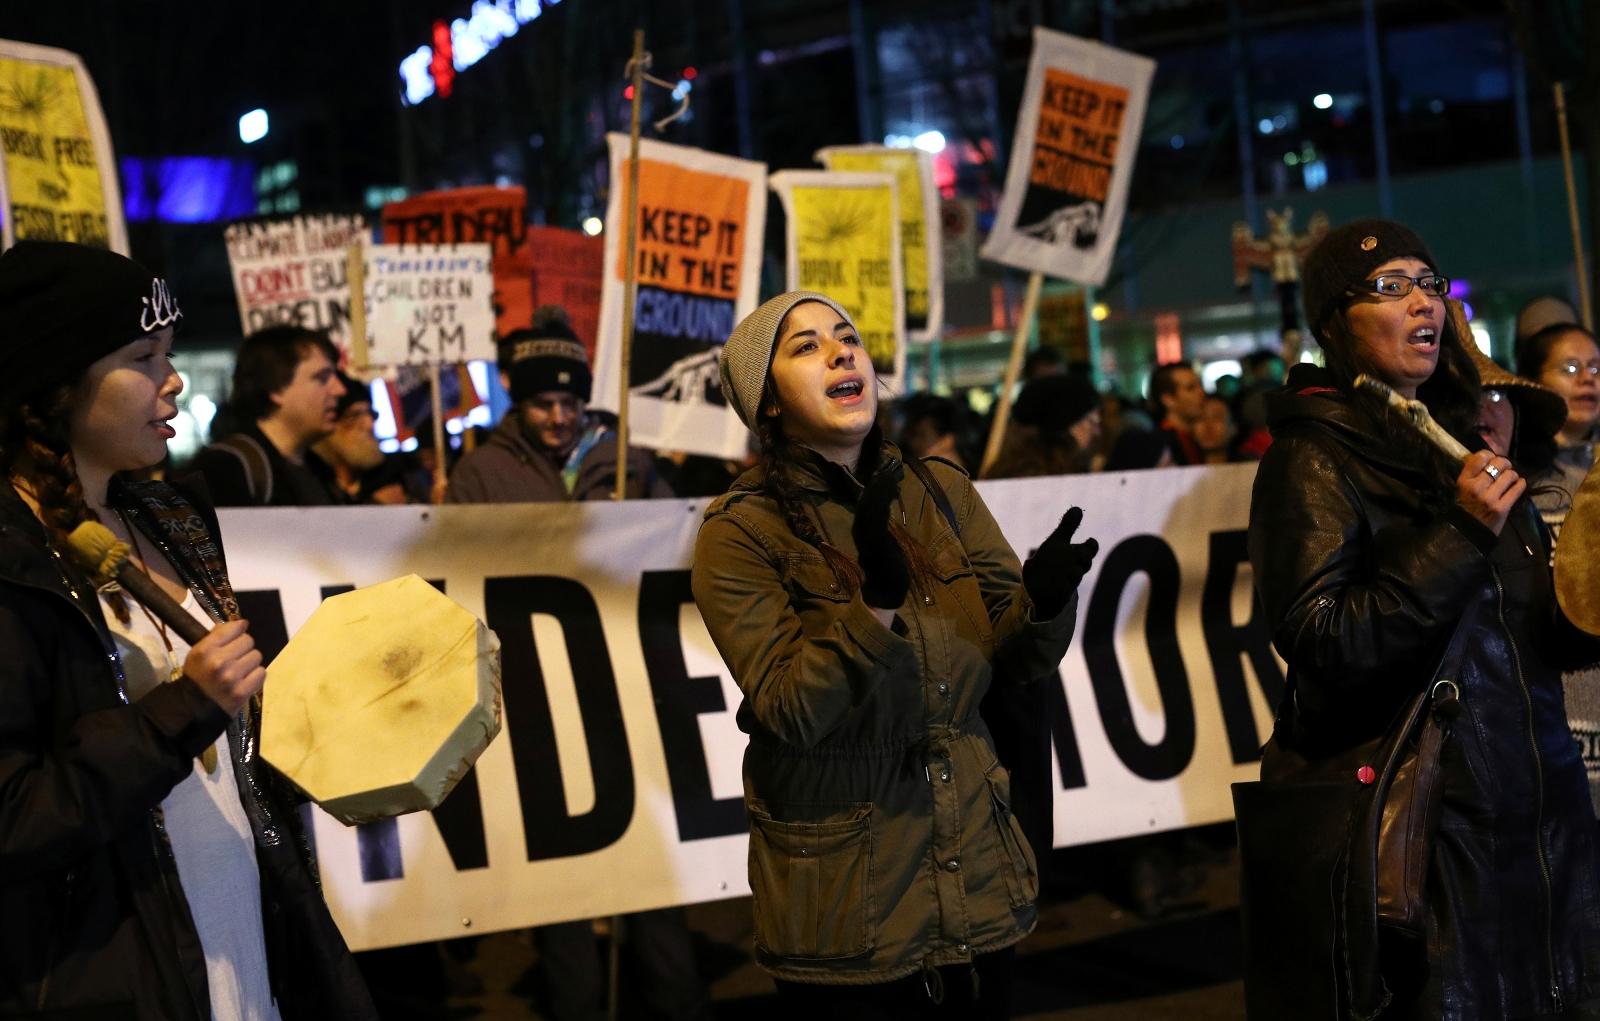 Vancouver protests Kinder Morgan pipeline